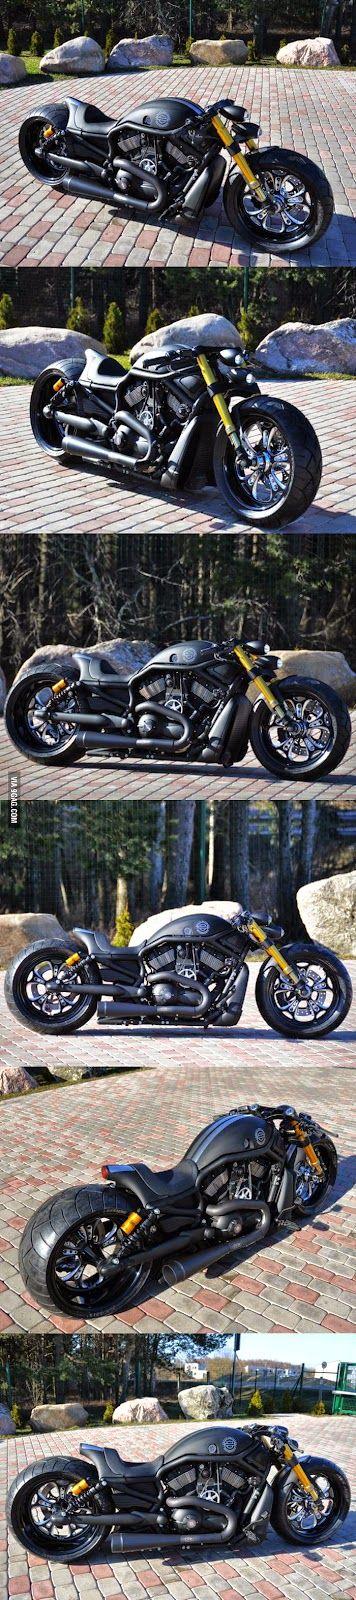 Custom Made Harley Davidson V Rod. Must Have